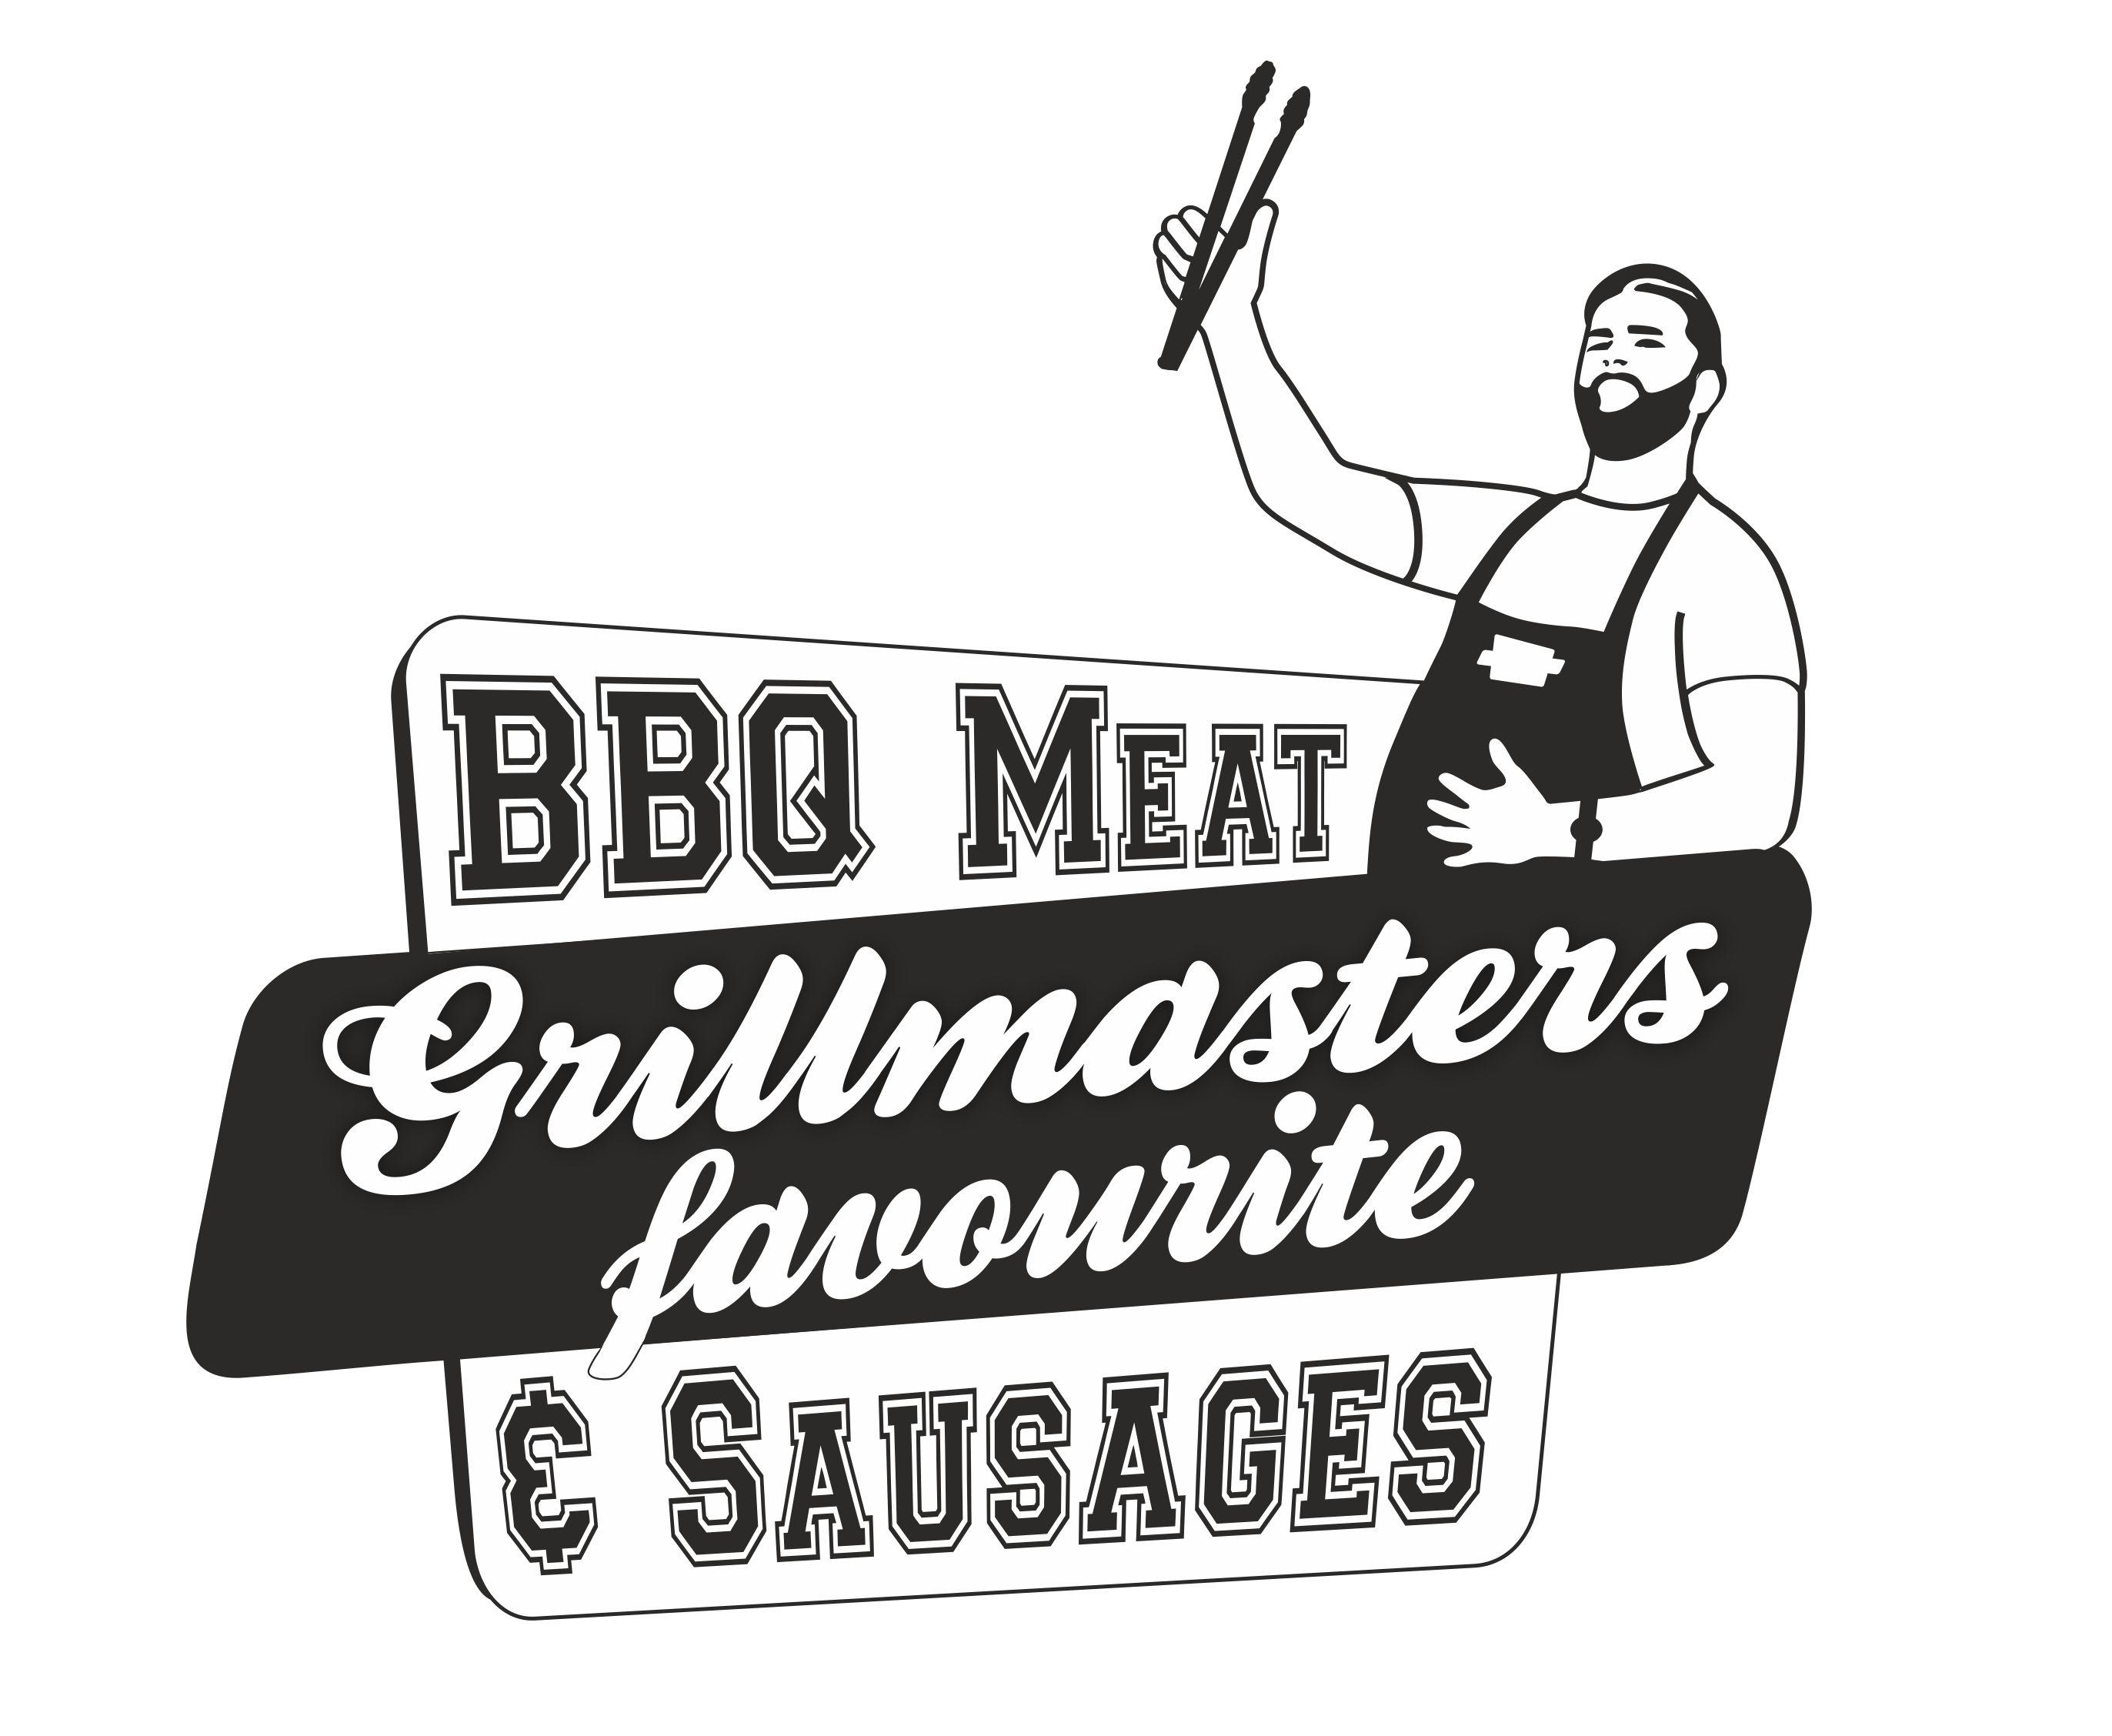 Grillmasters Favorite